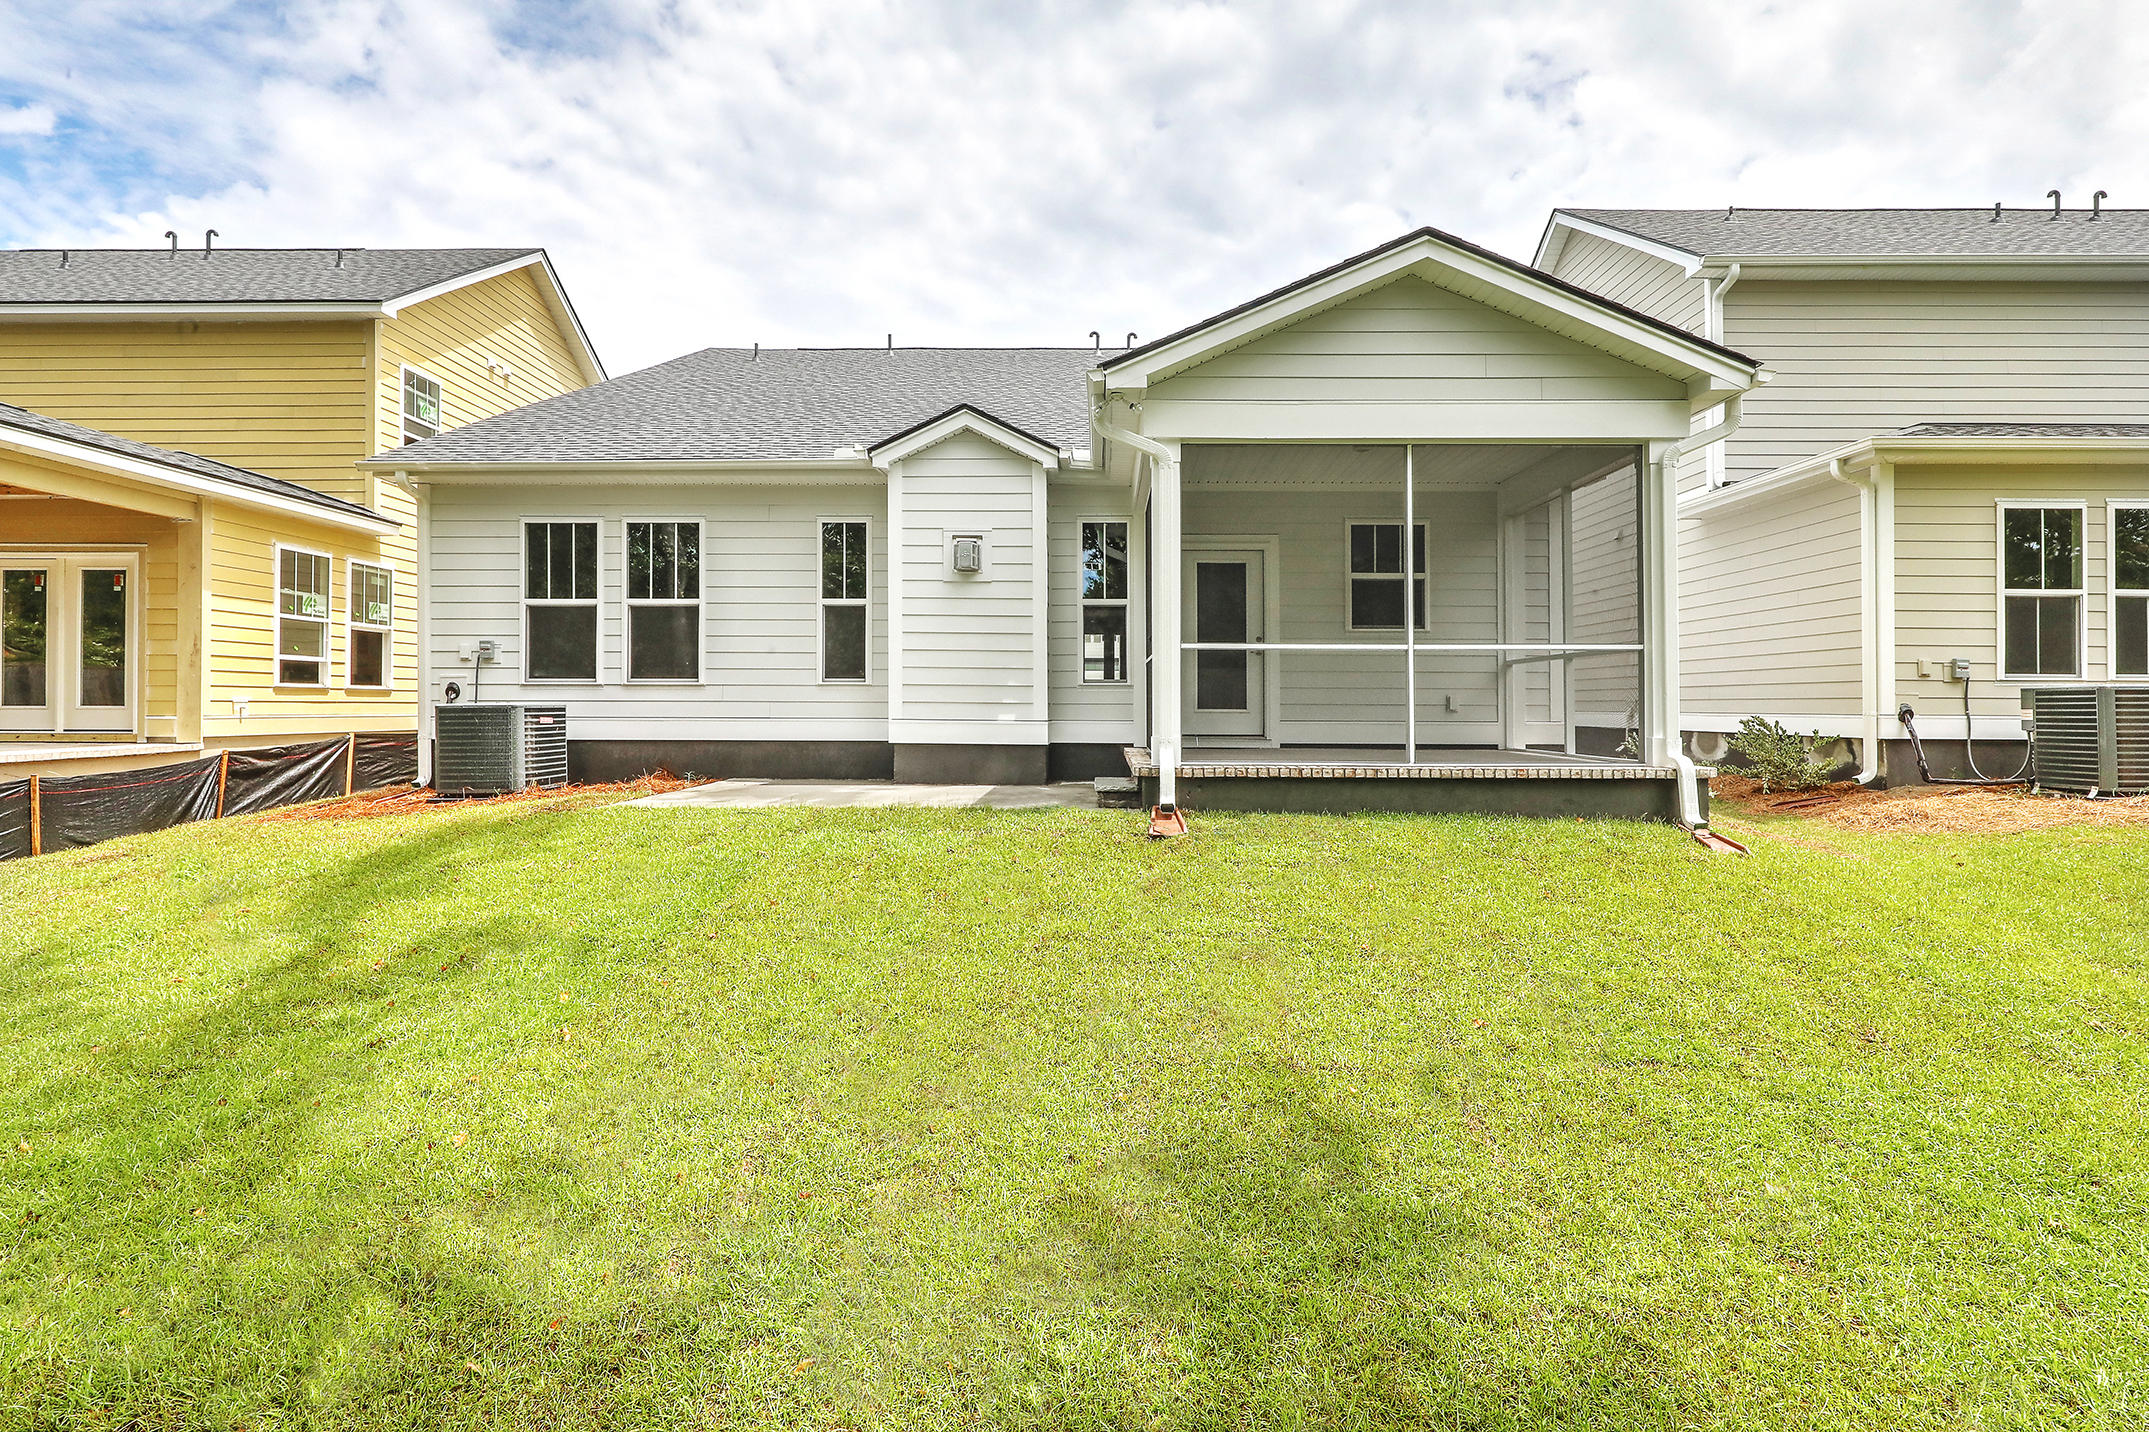 Bentley Park Homes For Sale - 1277 Gannett, Mount Pleasant, SC - 0